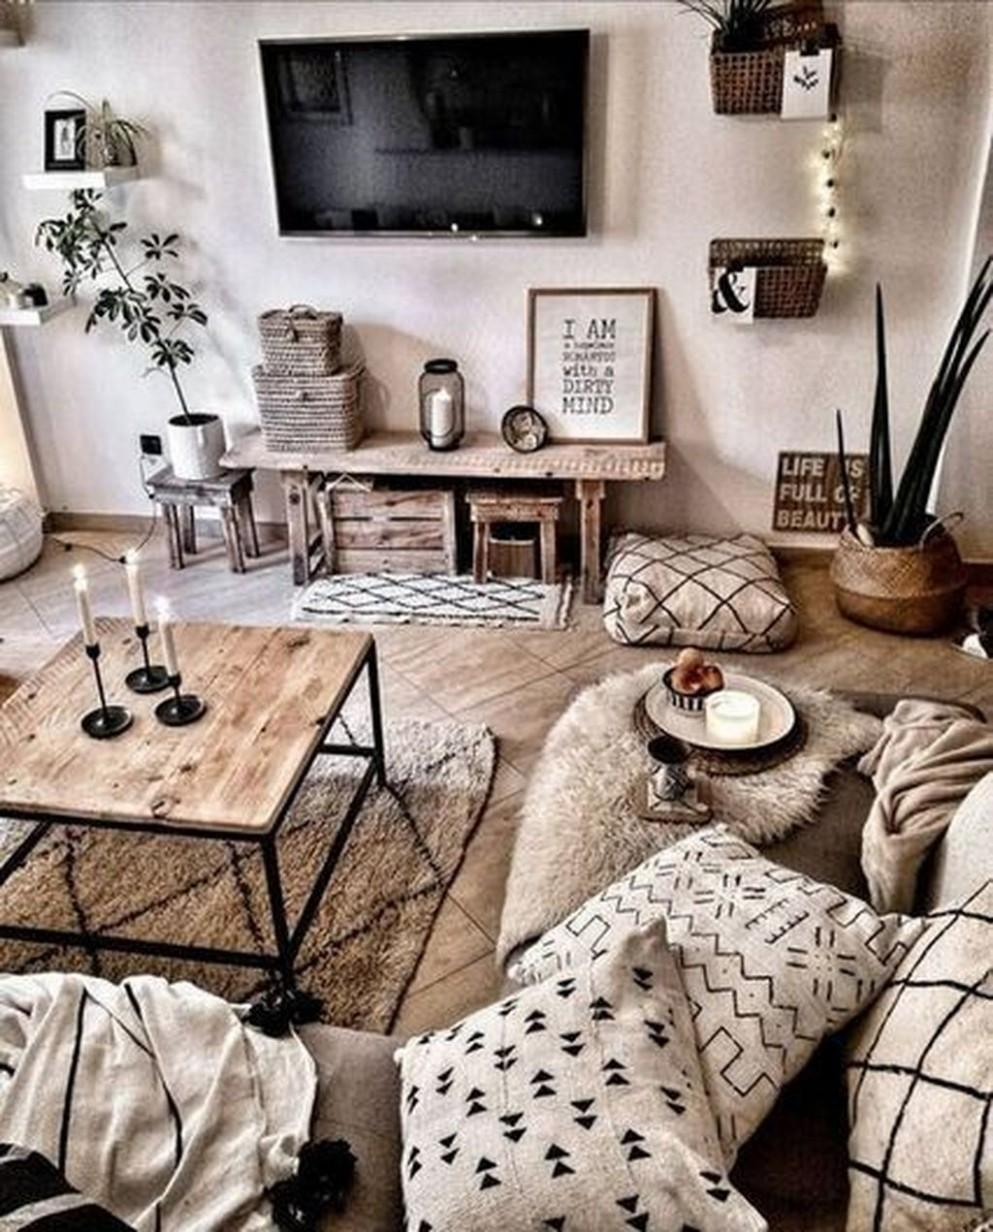 10 Classy Home Décor Ideas For Home Look Fabulous  Apartment  - Rustic Apartment Decor Ideas